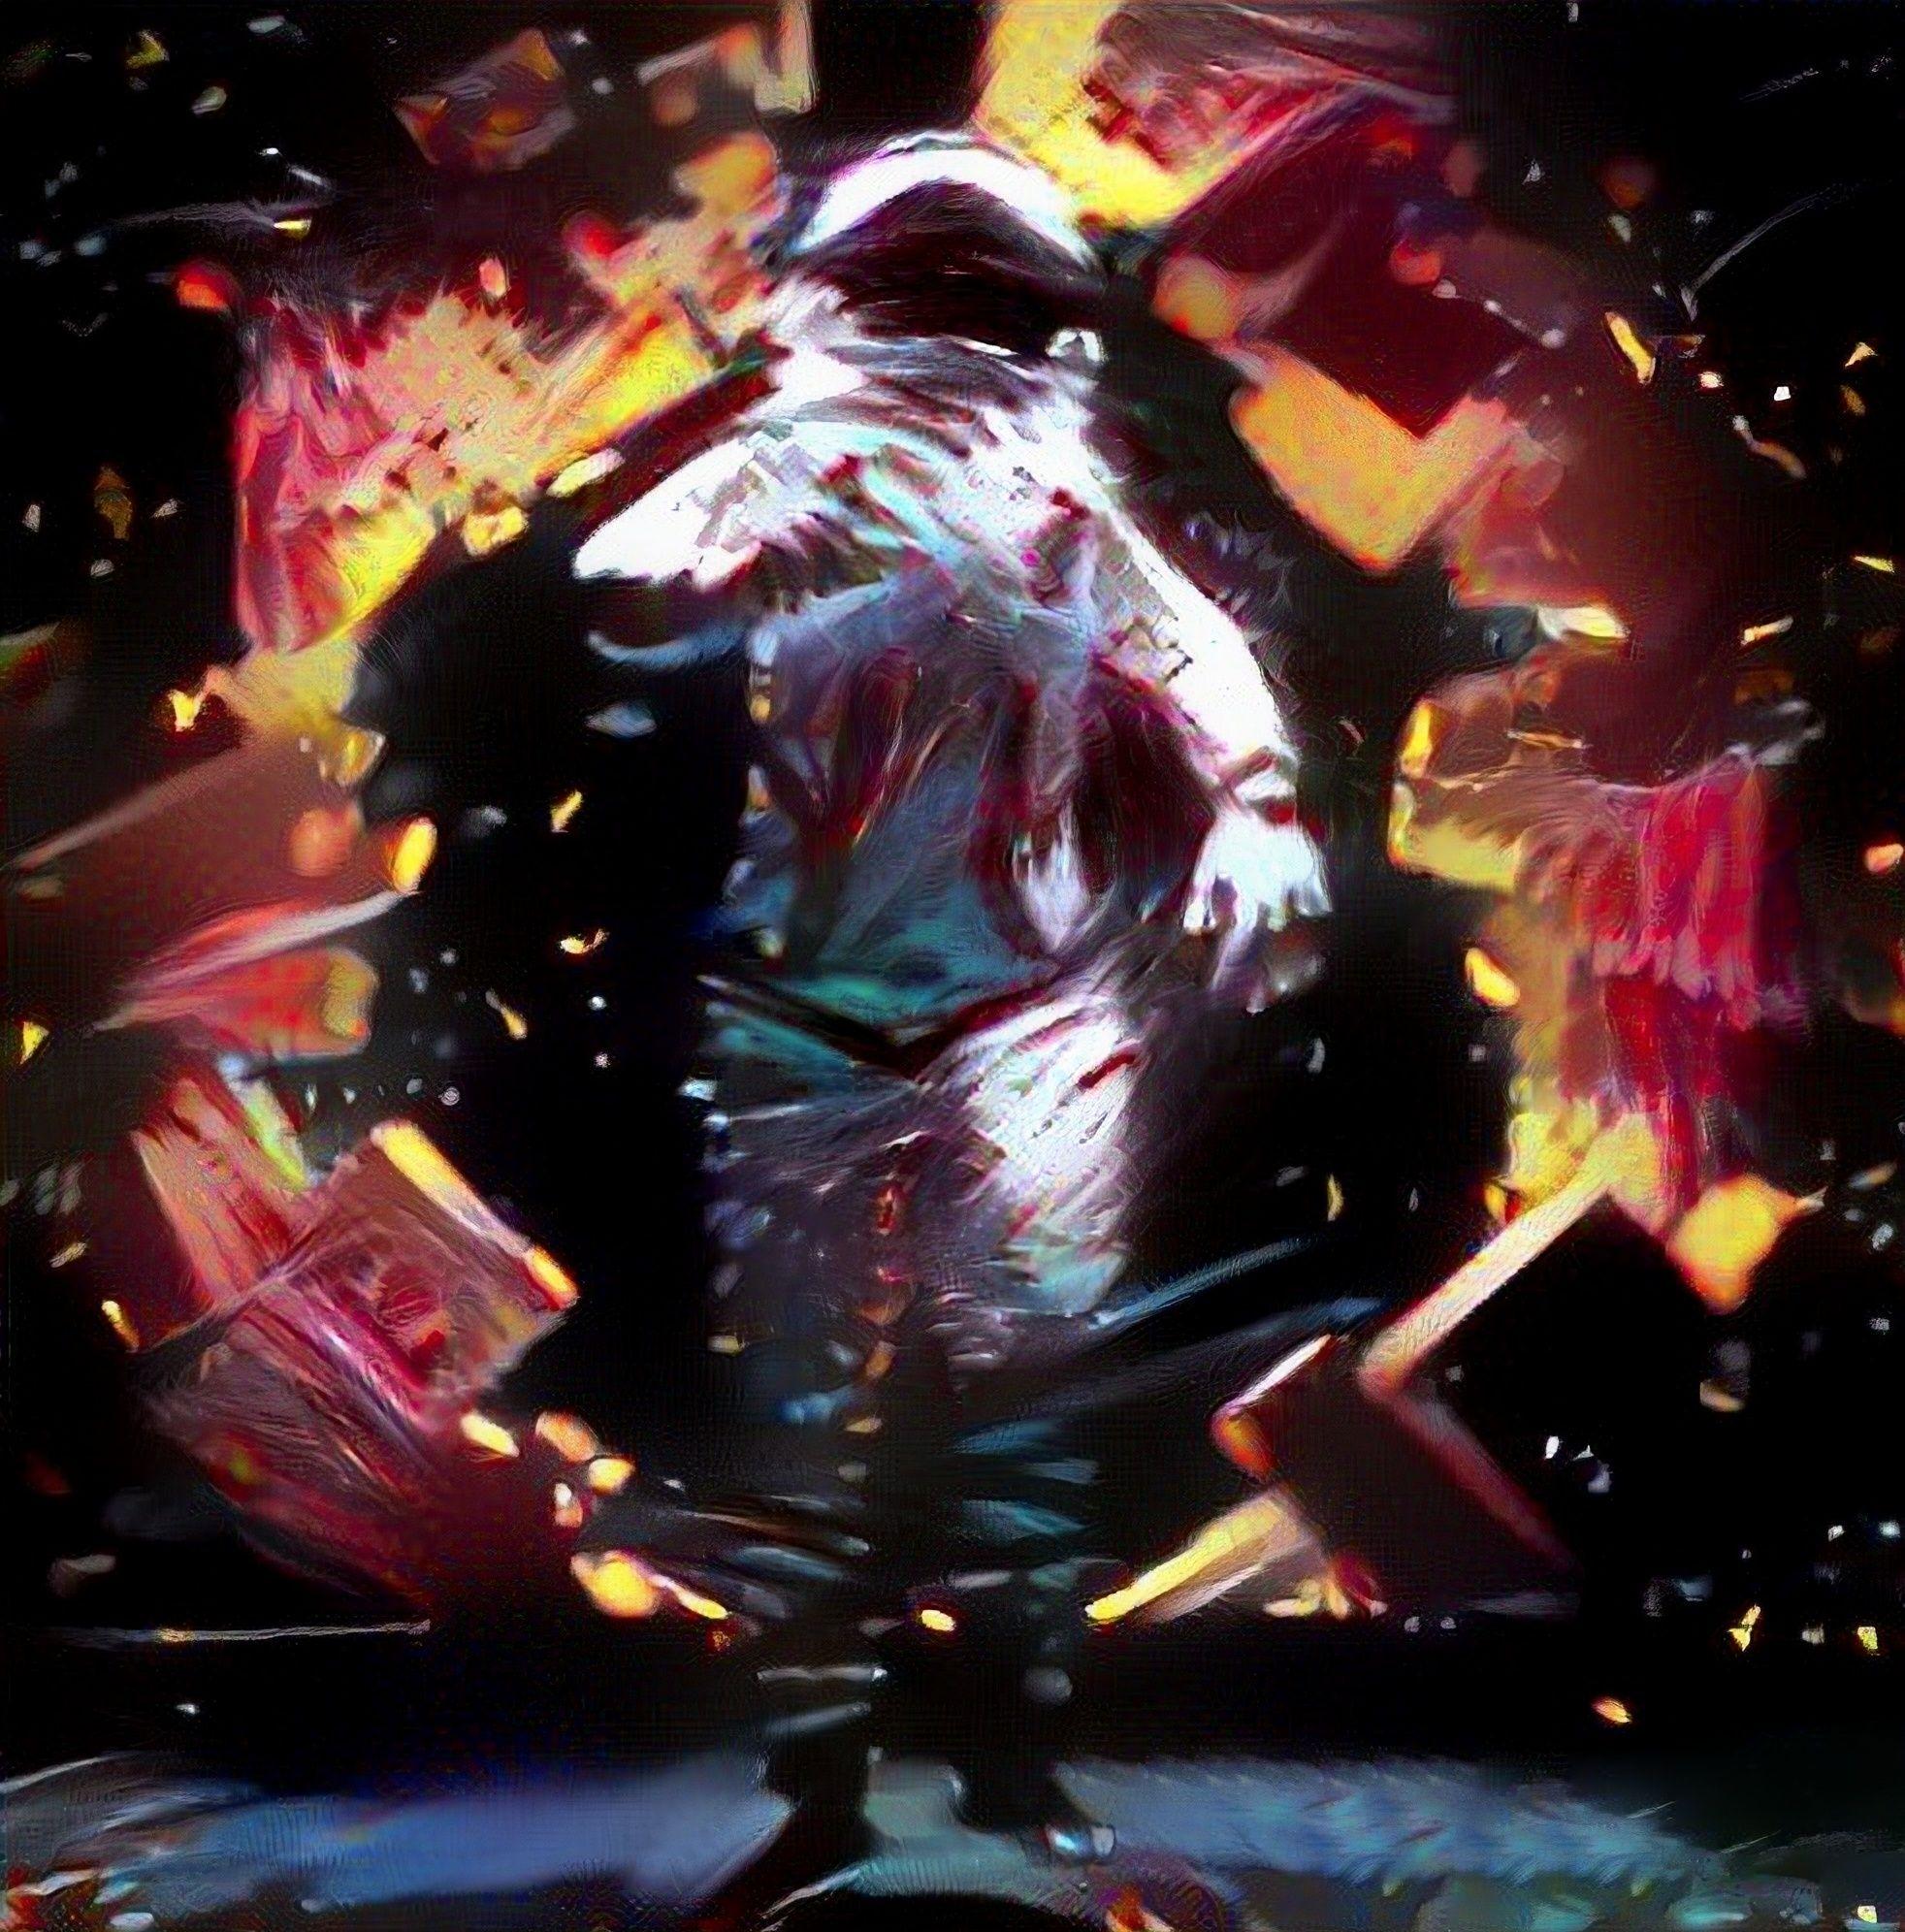 VR Art vrhuman Astronaut Artwork painting virtual reality